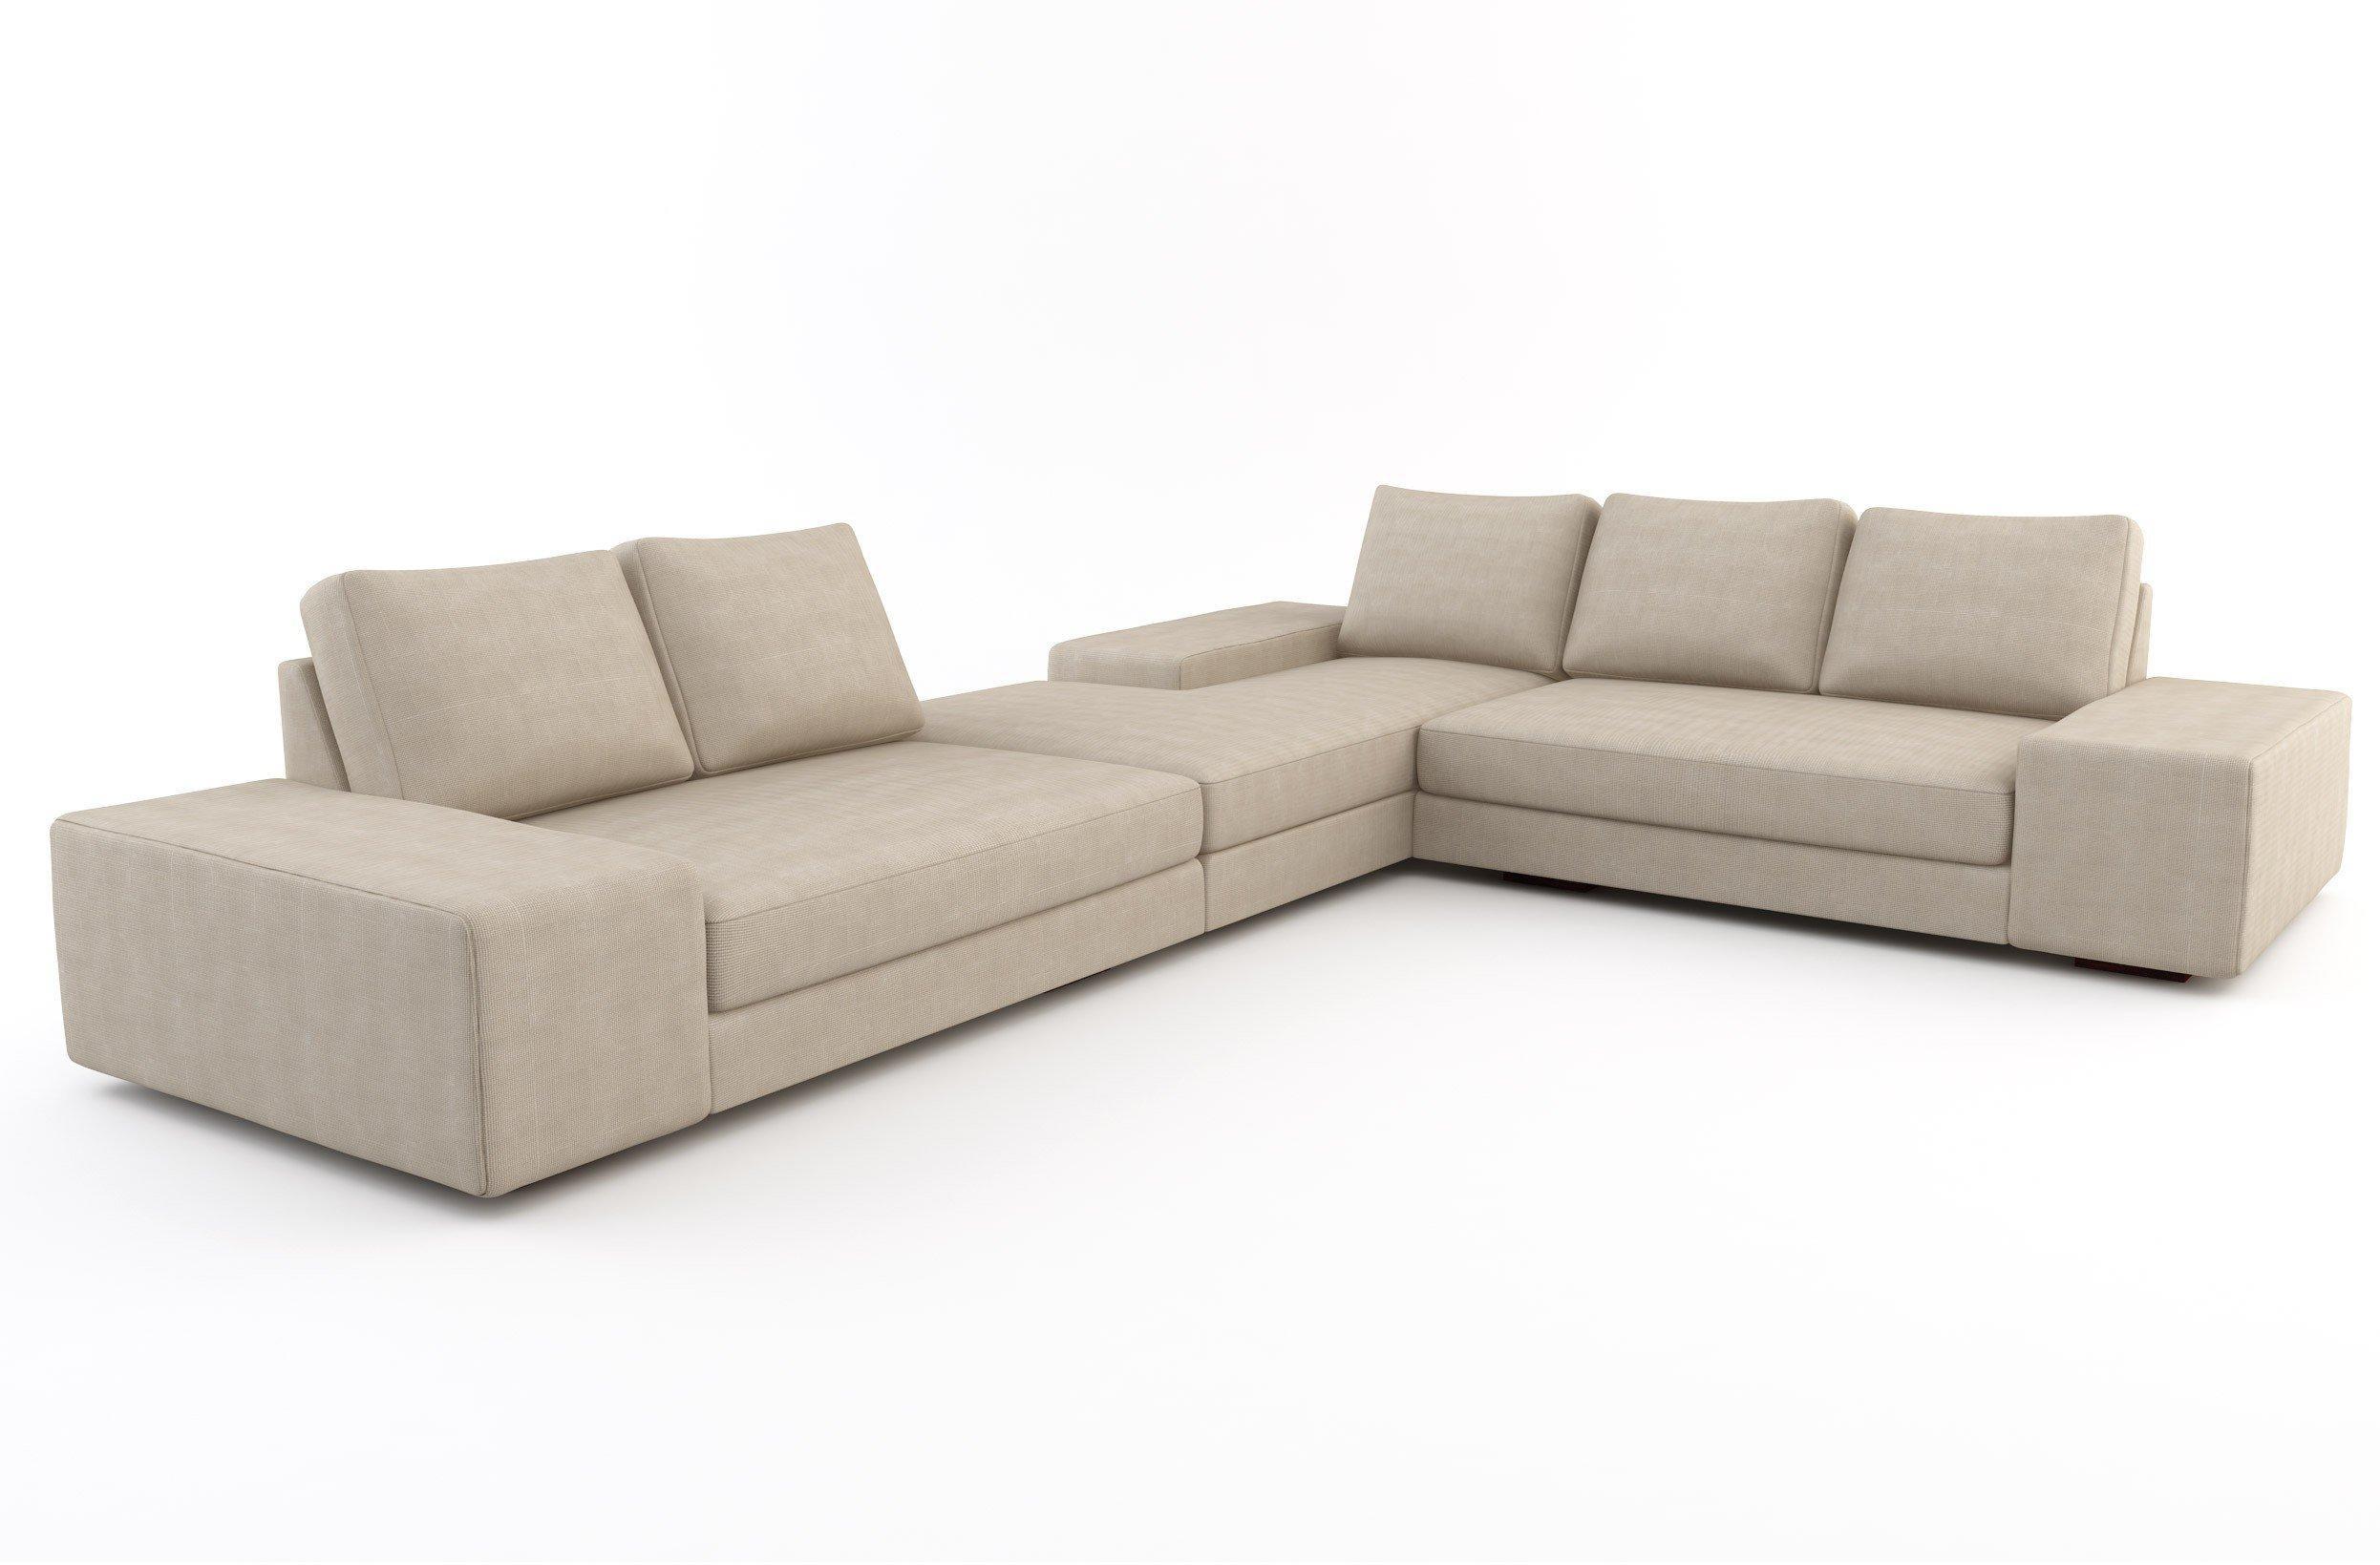 Chai Microsuede Sofa Bed | Sofa Gallery | Kengire Intended For Chai Microsuede Sofa Beds (Image 3 of 20)